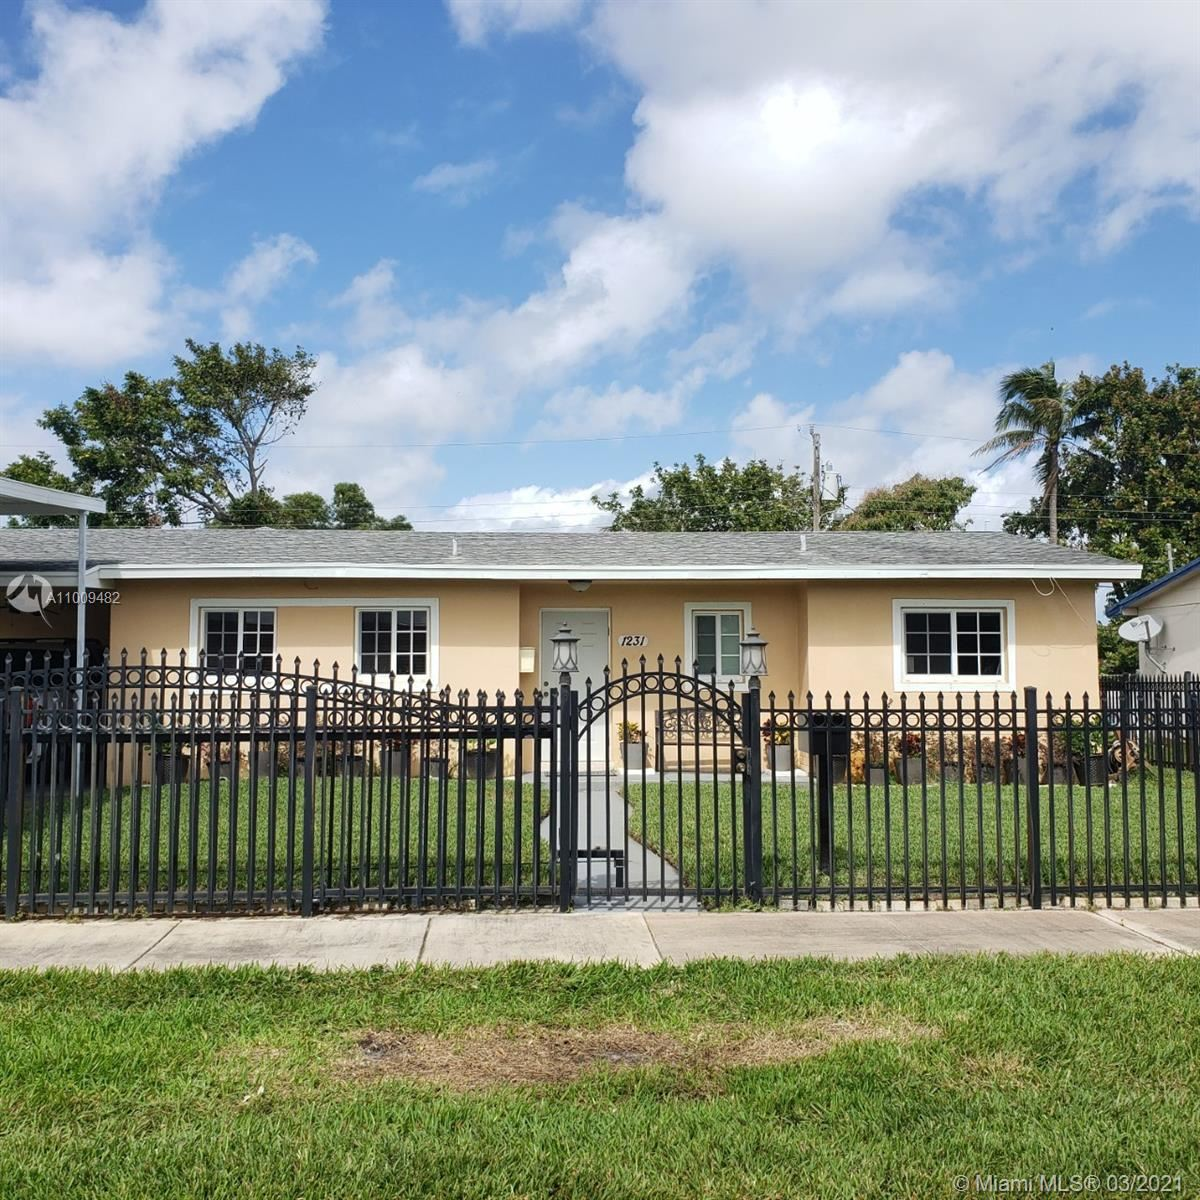 1231 NW 179th Ter, Miami Gardens, FL 33169 - #: A11009482